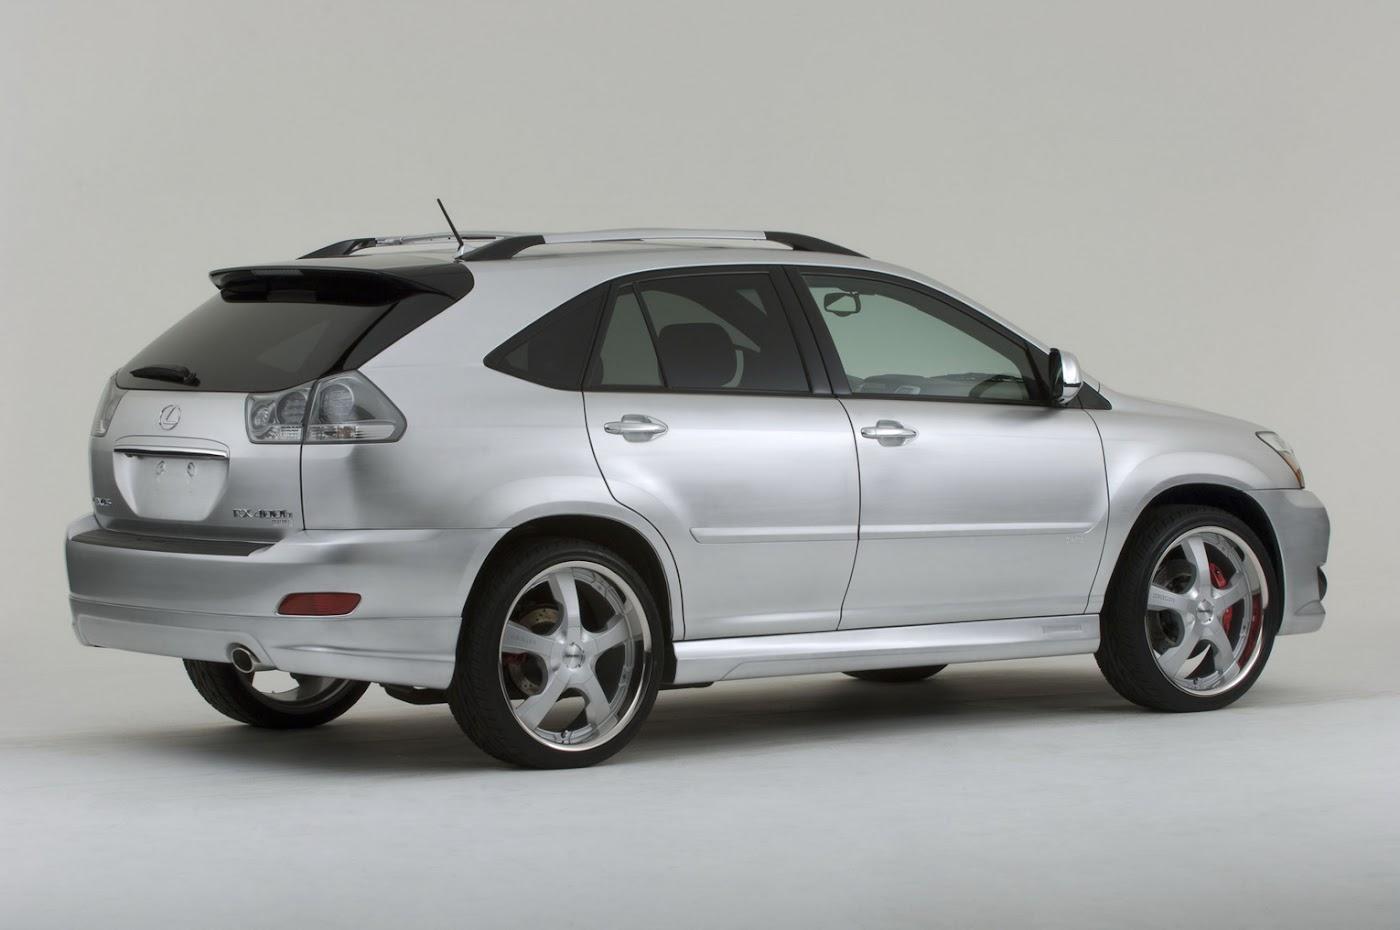 highlander hybrid and lexus rx 400h recall auto car reviews. Black Bedroom Furniture Sets. Home Design Ideas